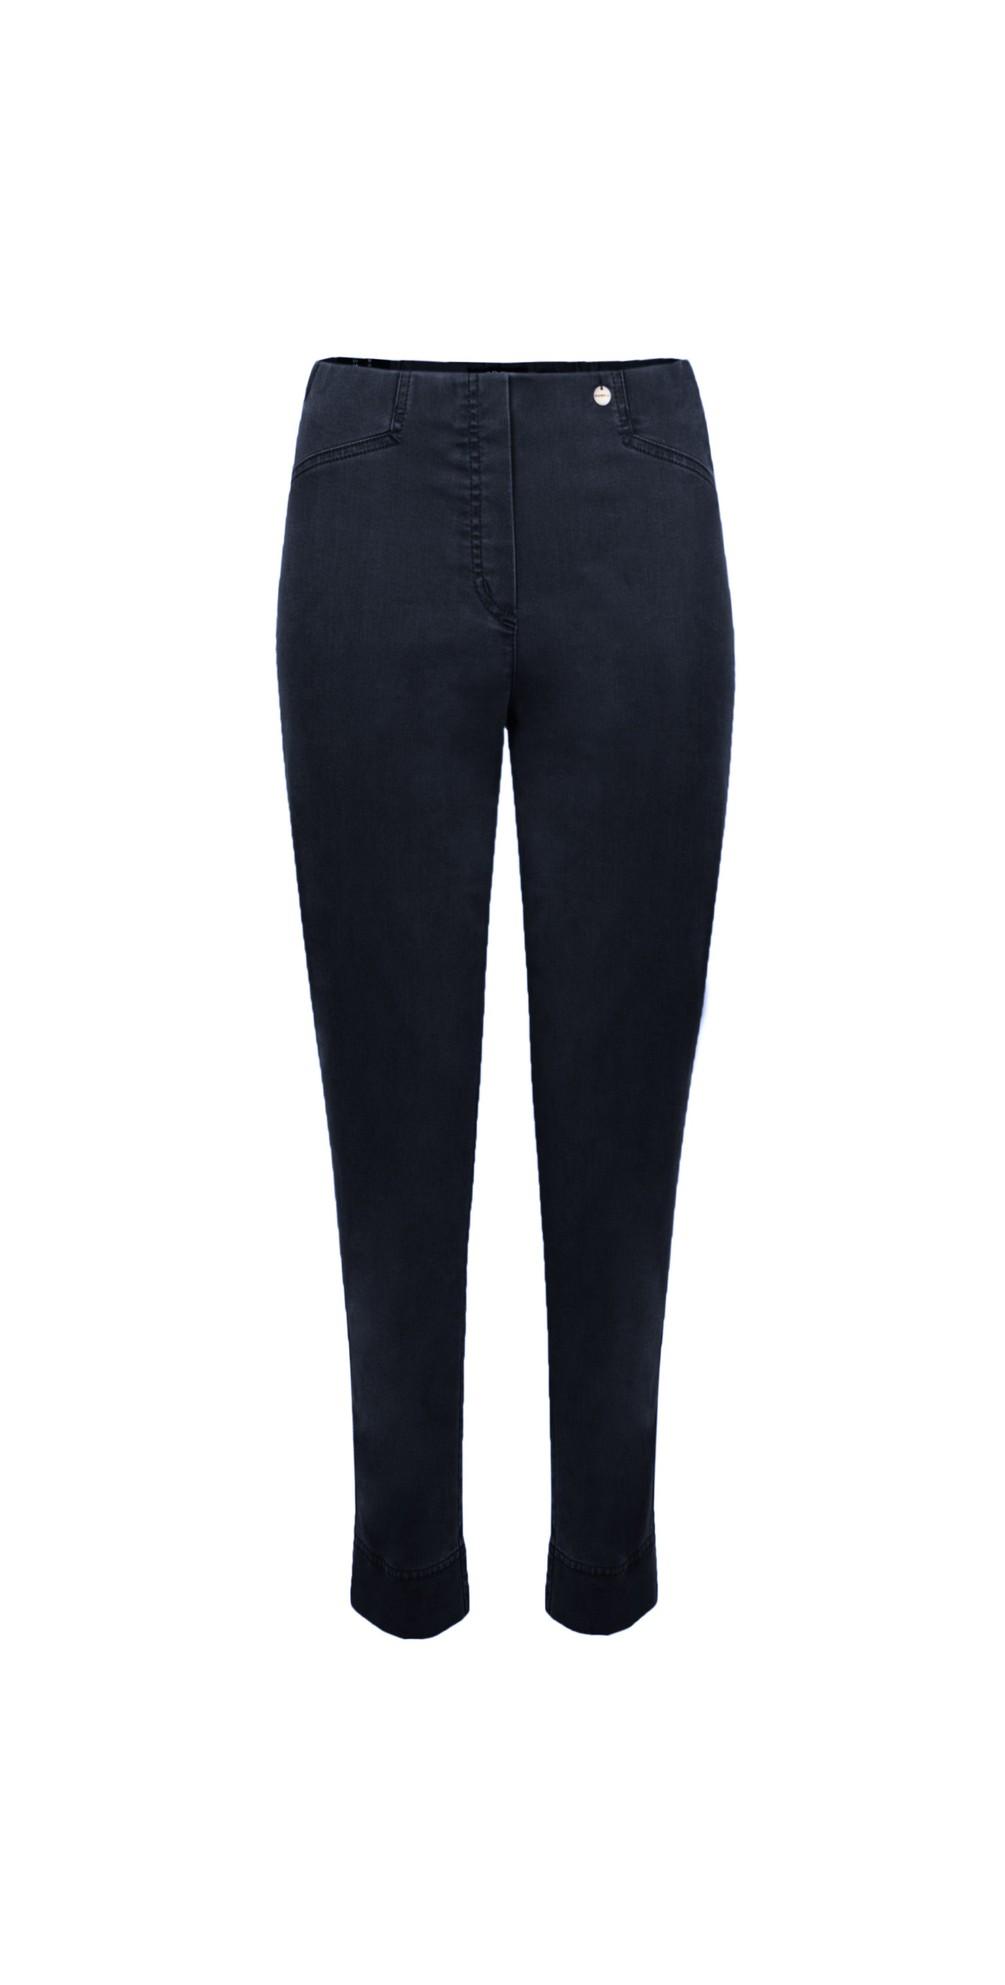 Rose 09 Navy Ankle Length Slimfit Jean main image